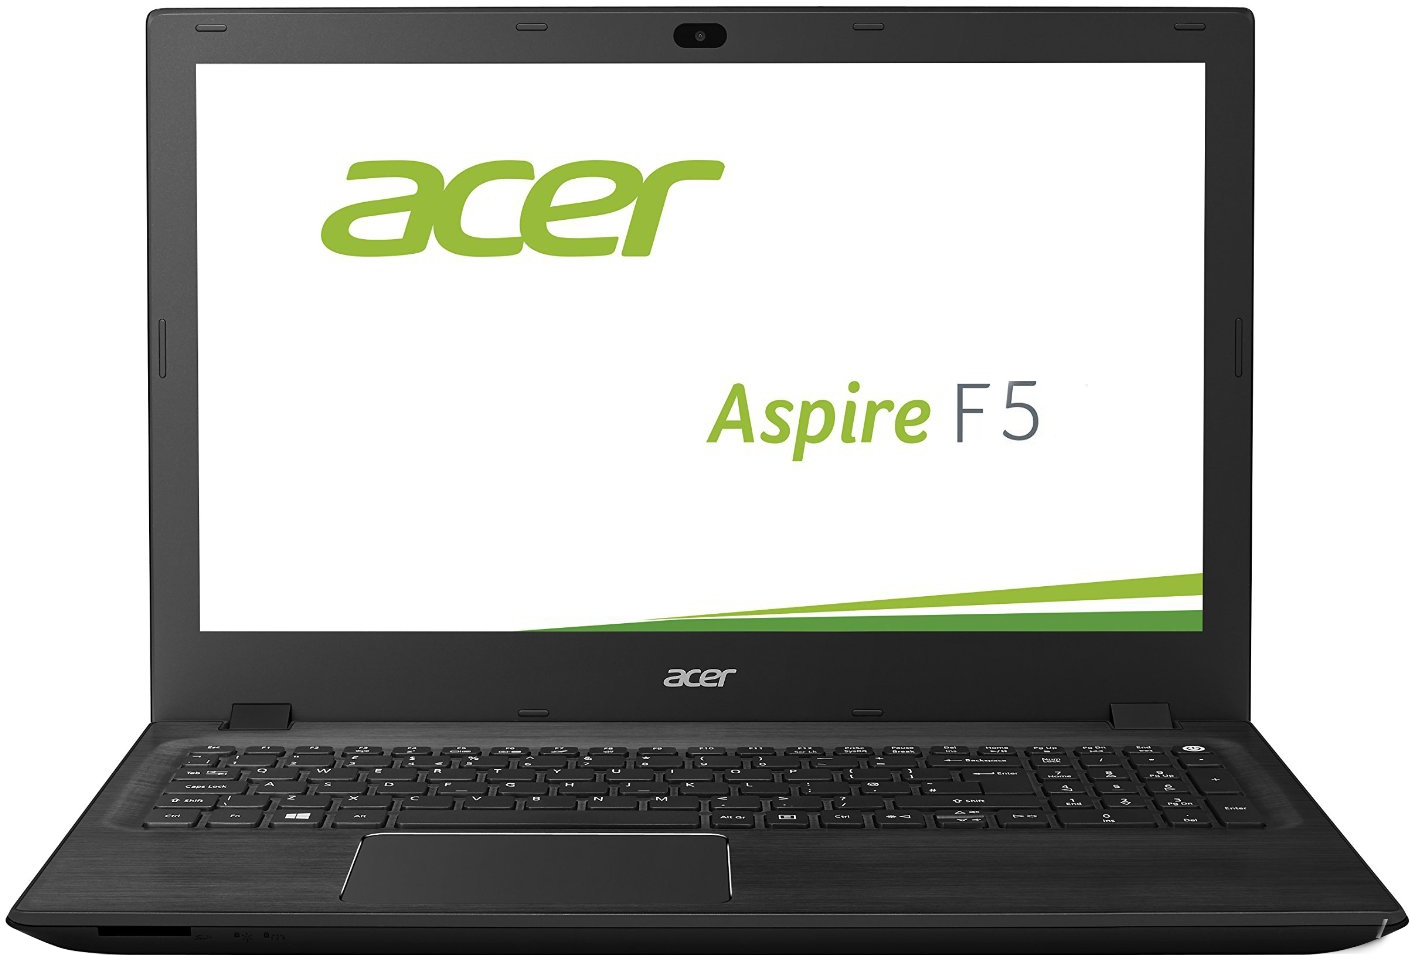 Aspire F5